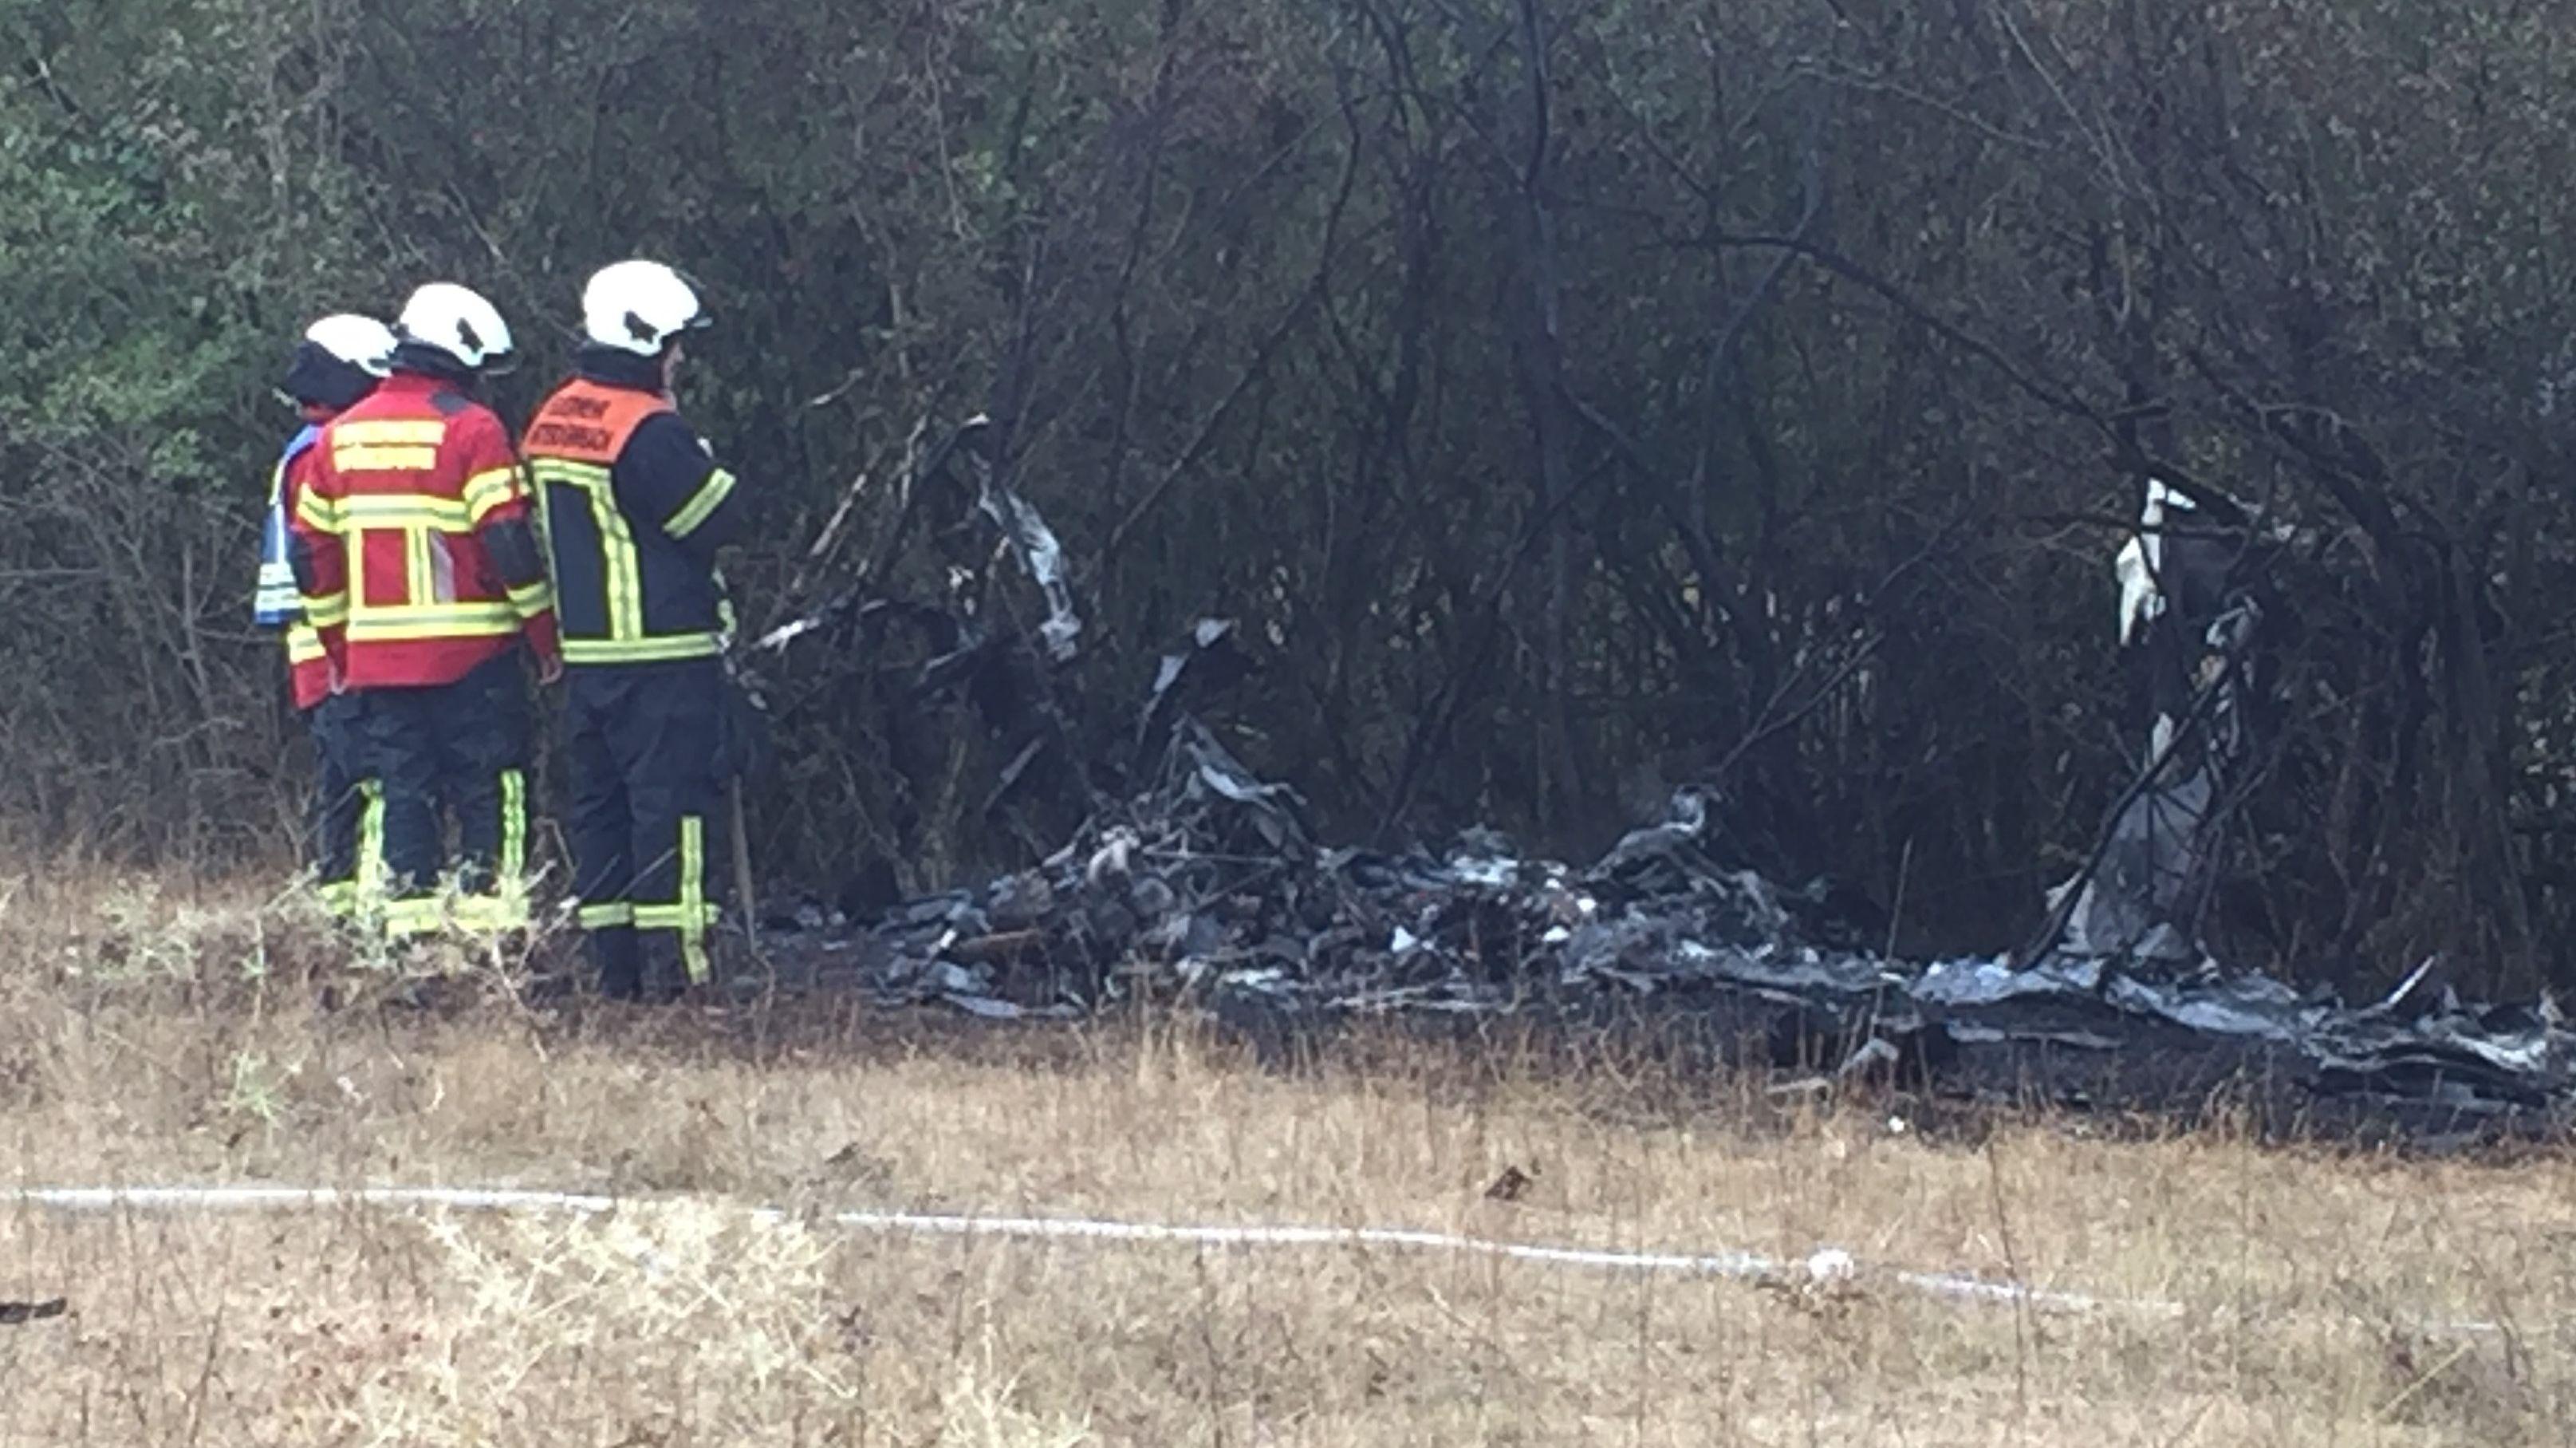 Feuerwehrleute am gelöschten-Ultra-Leicht-Flugzeug am Würzburger Schenkenturm